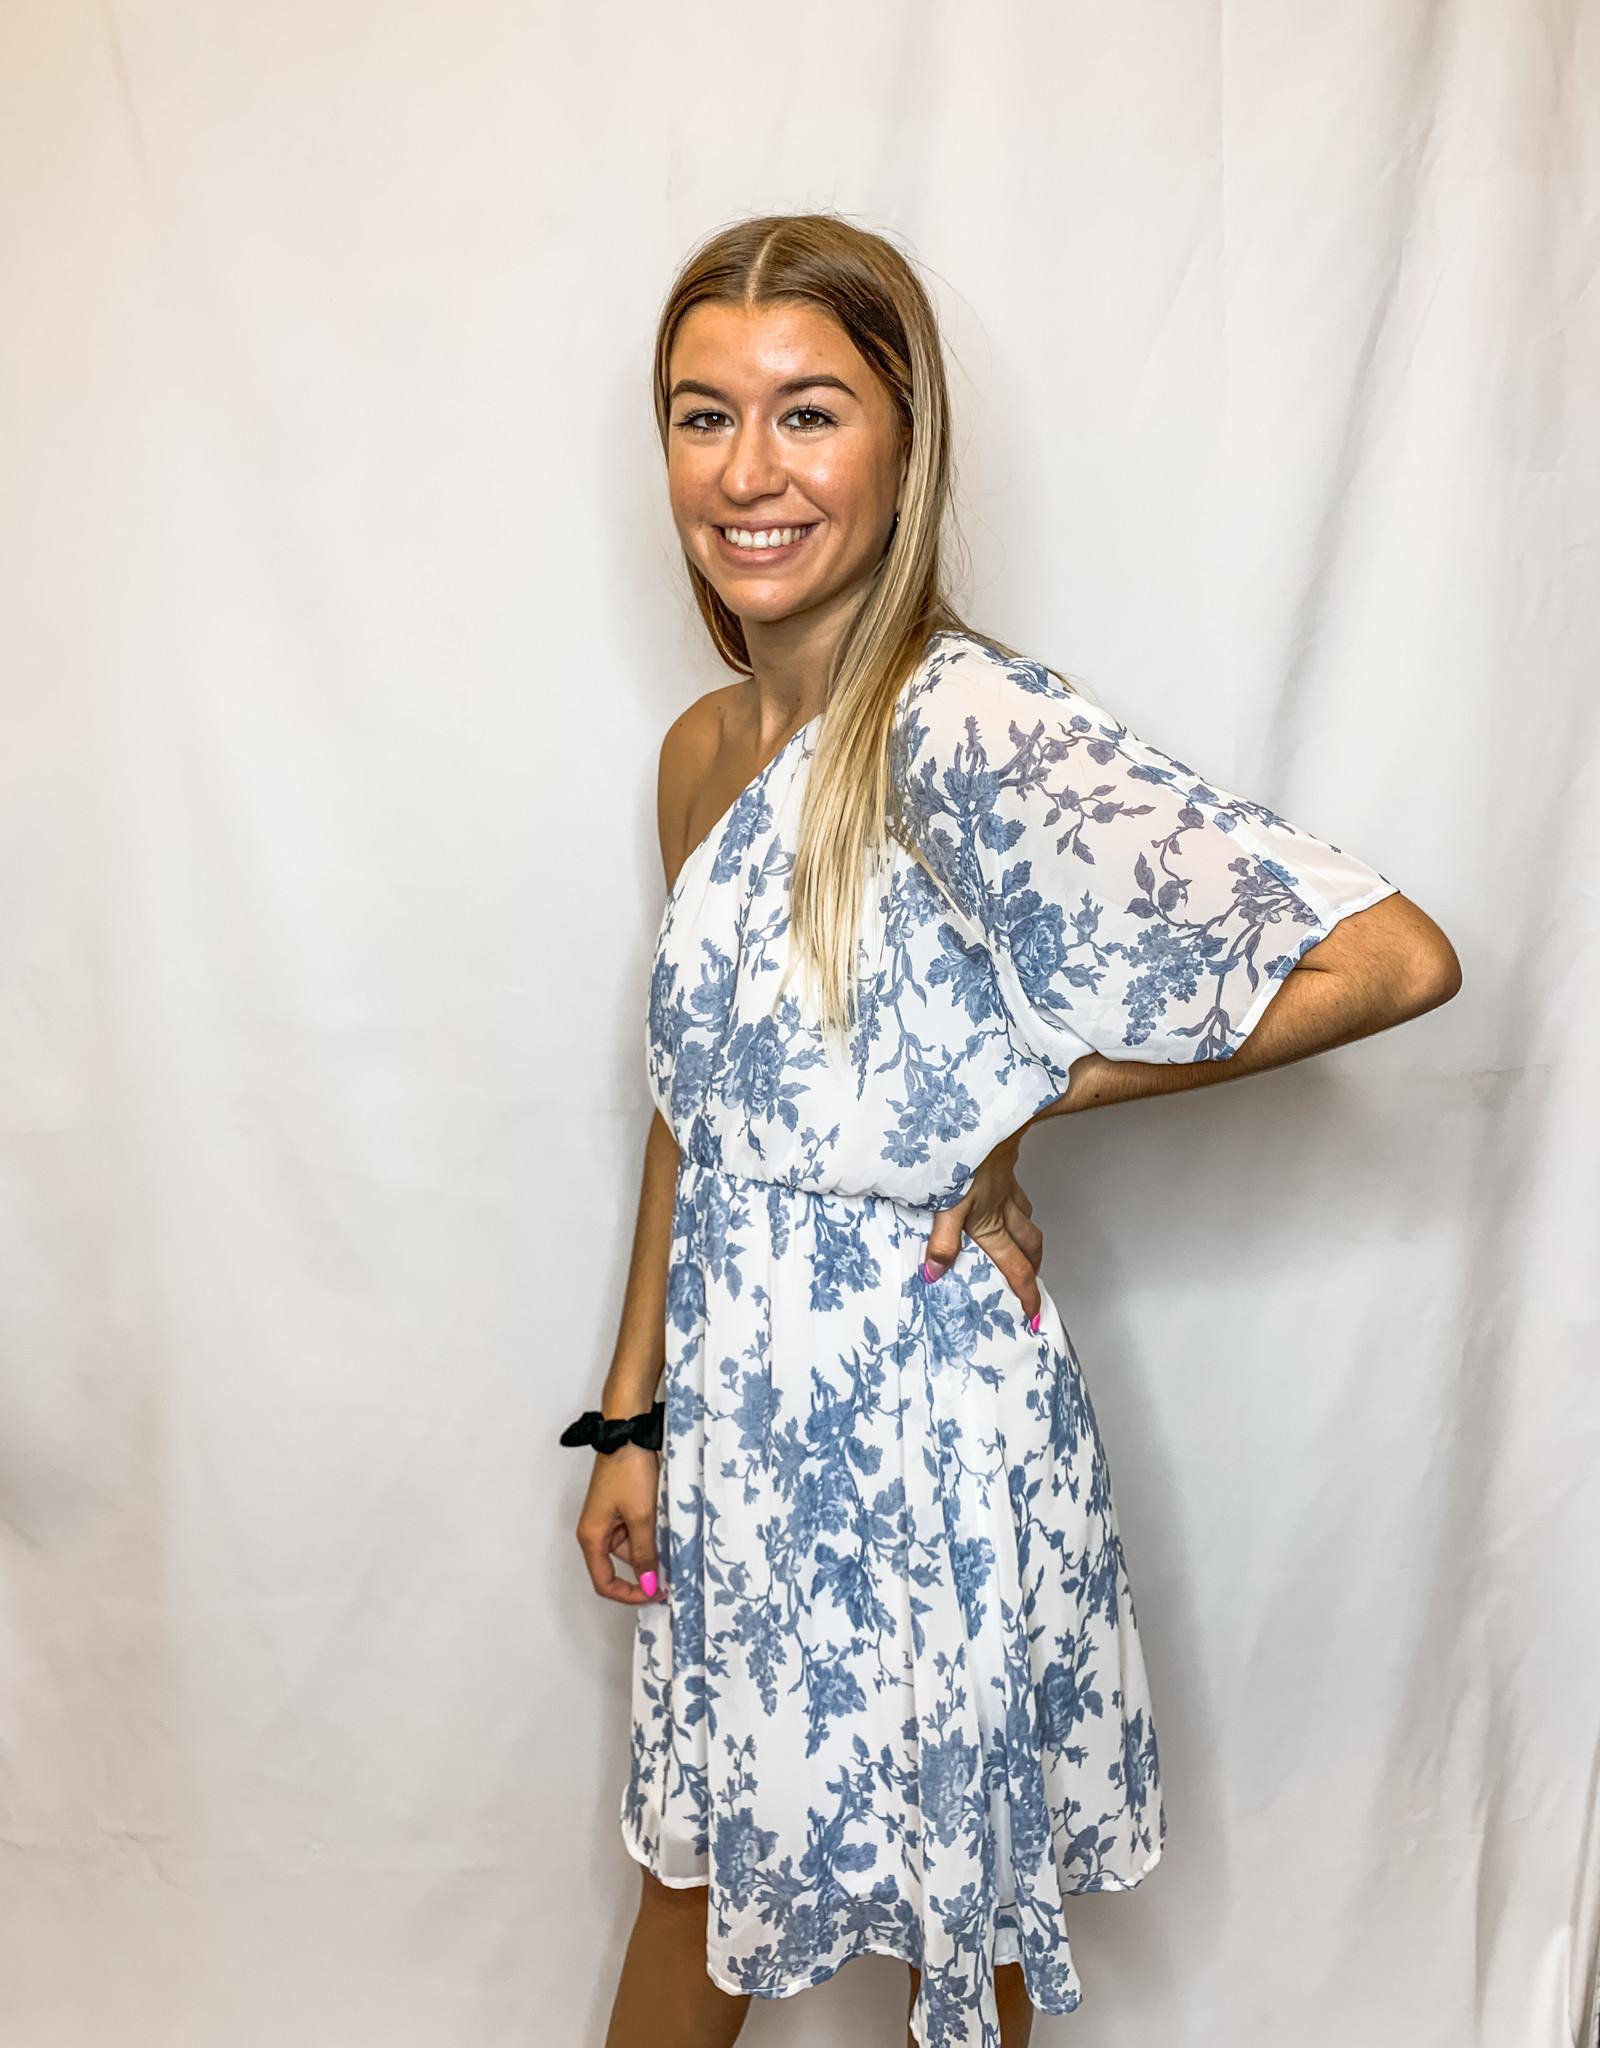 Blue Toile Dress